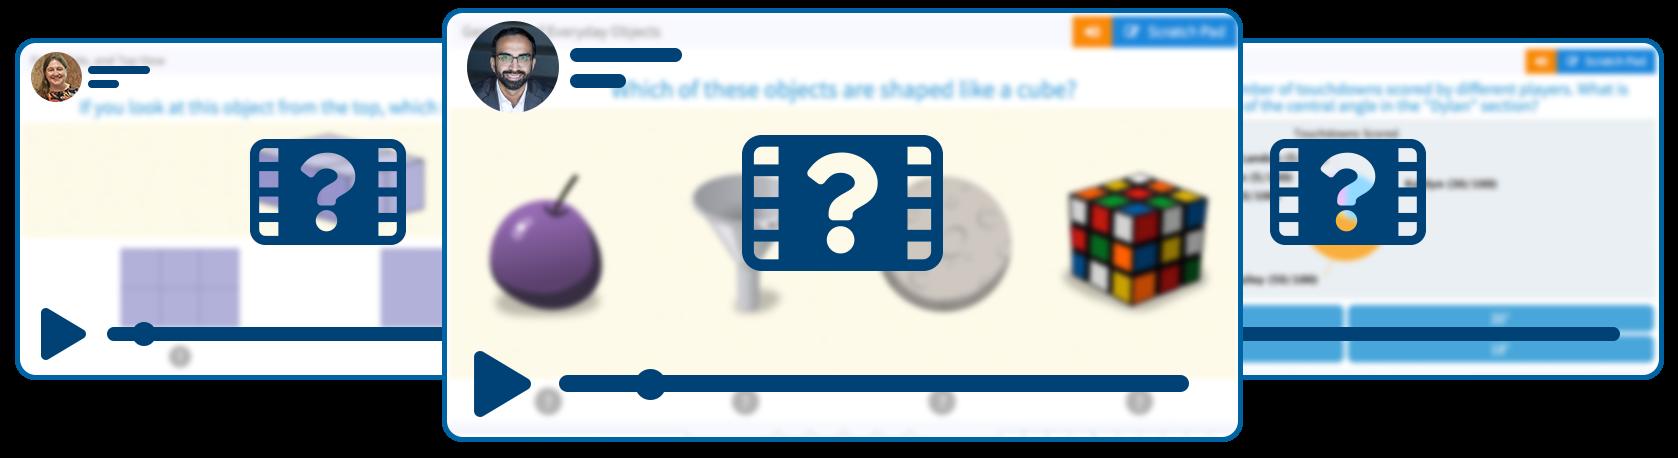 MathGames Video Tutorials